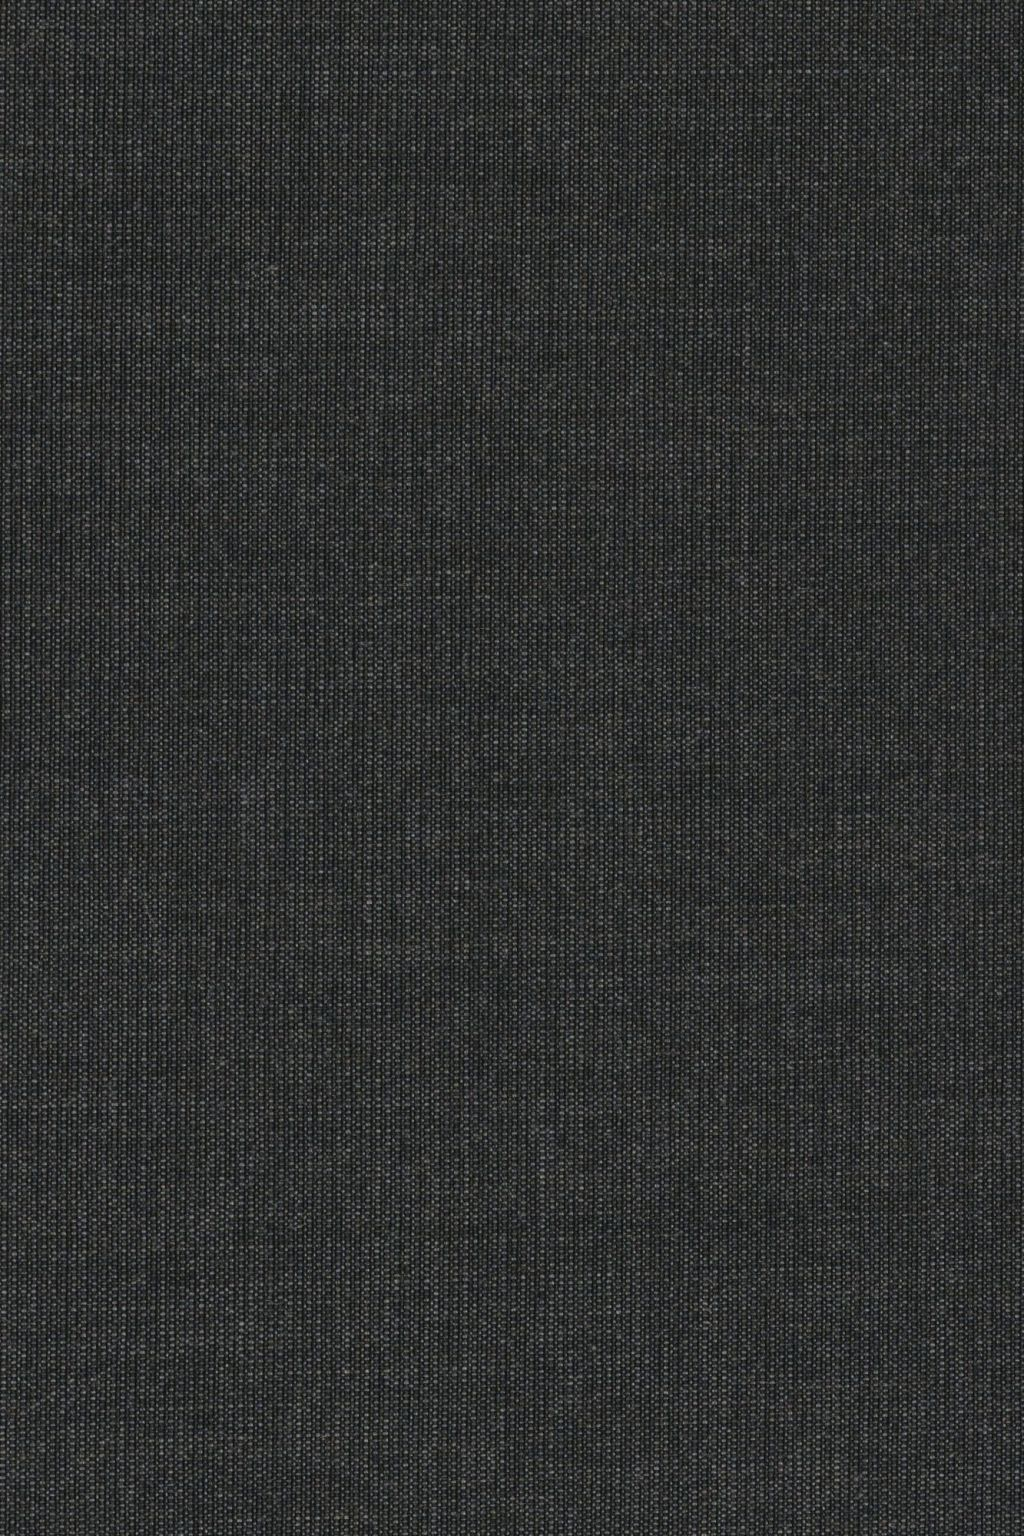 Canvas 1725